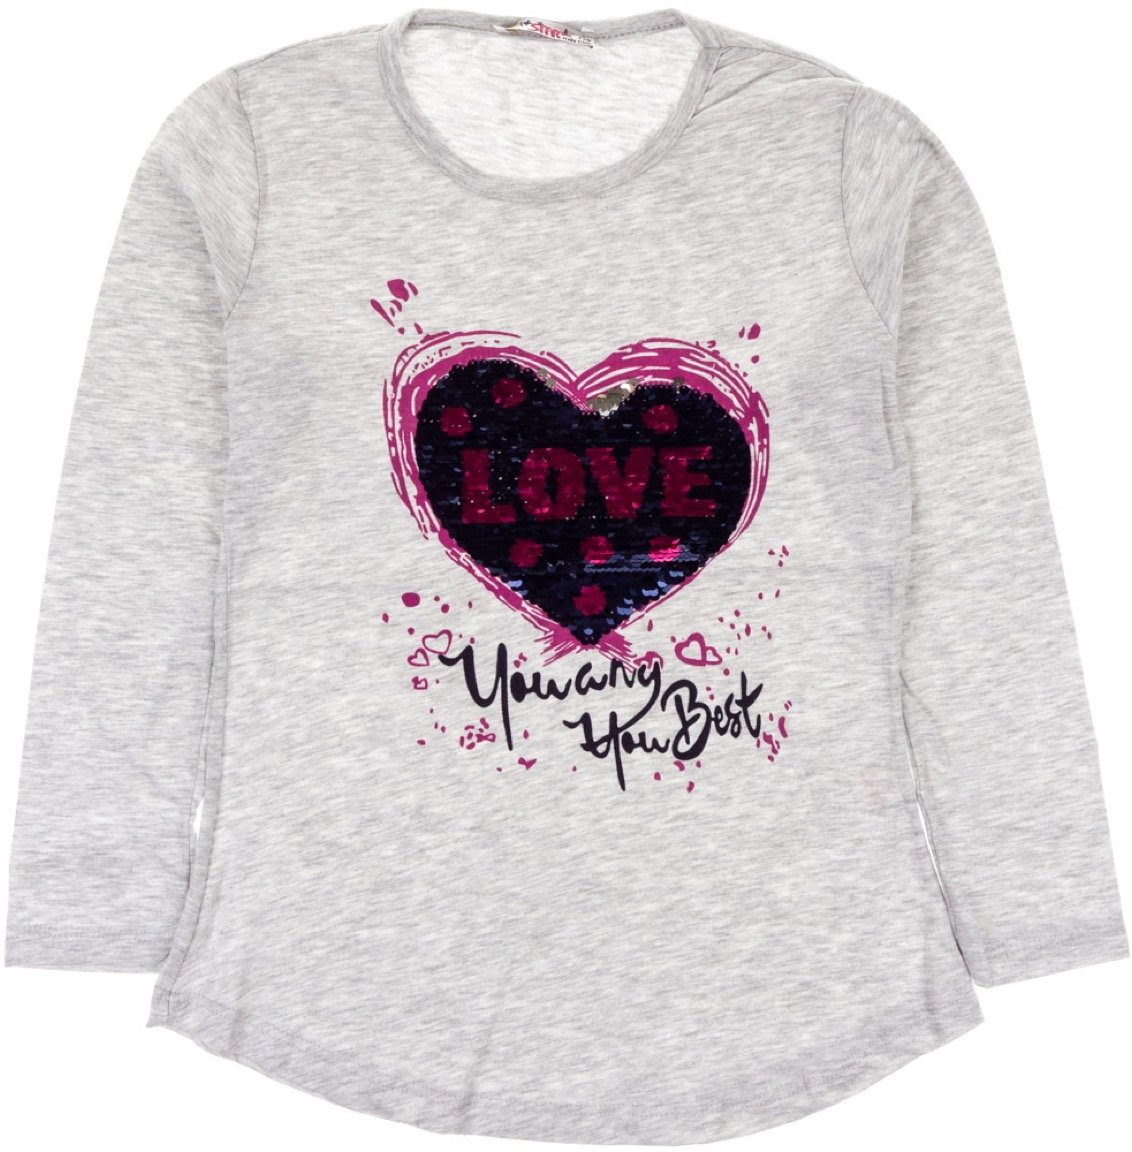 Mix Star παιδική εποχιακή μπλούζα «Grey Best Love»